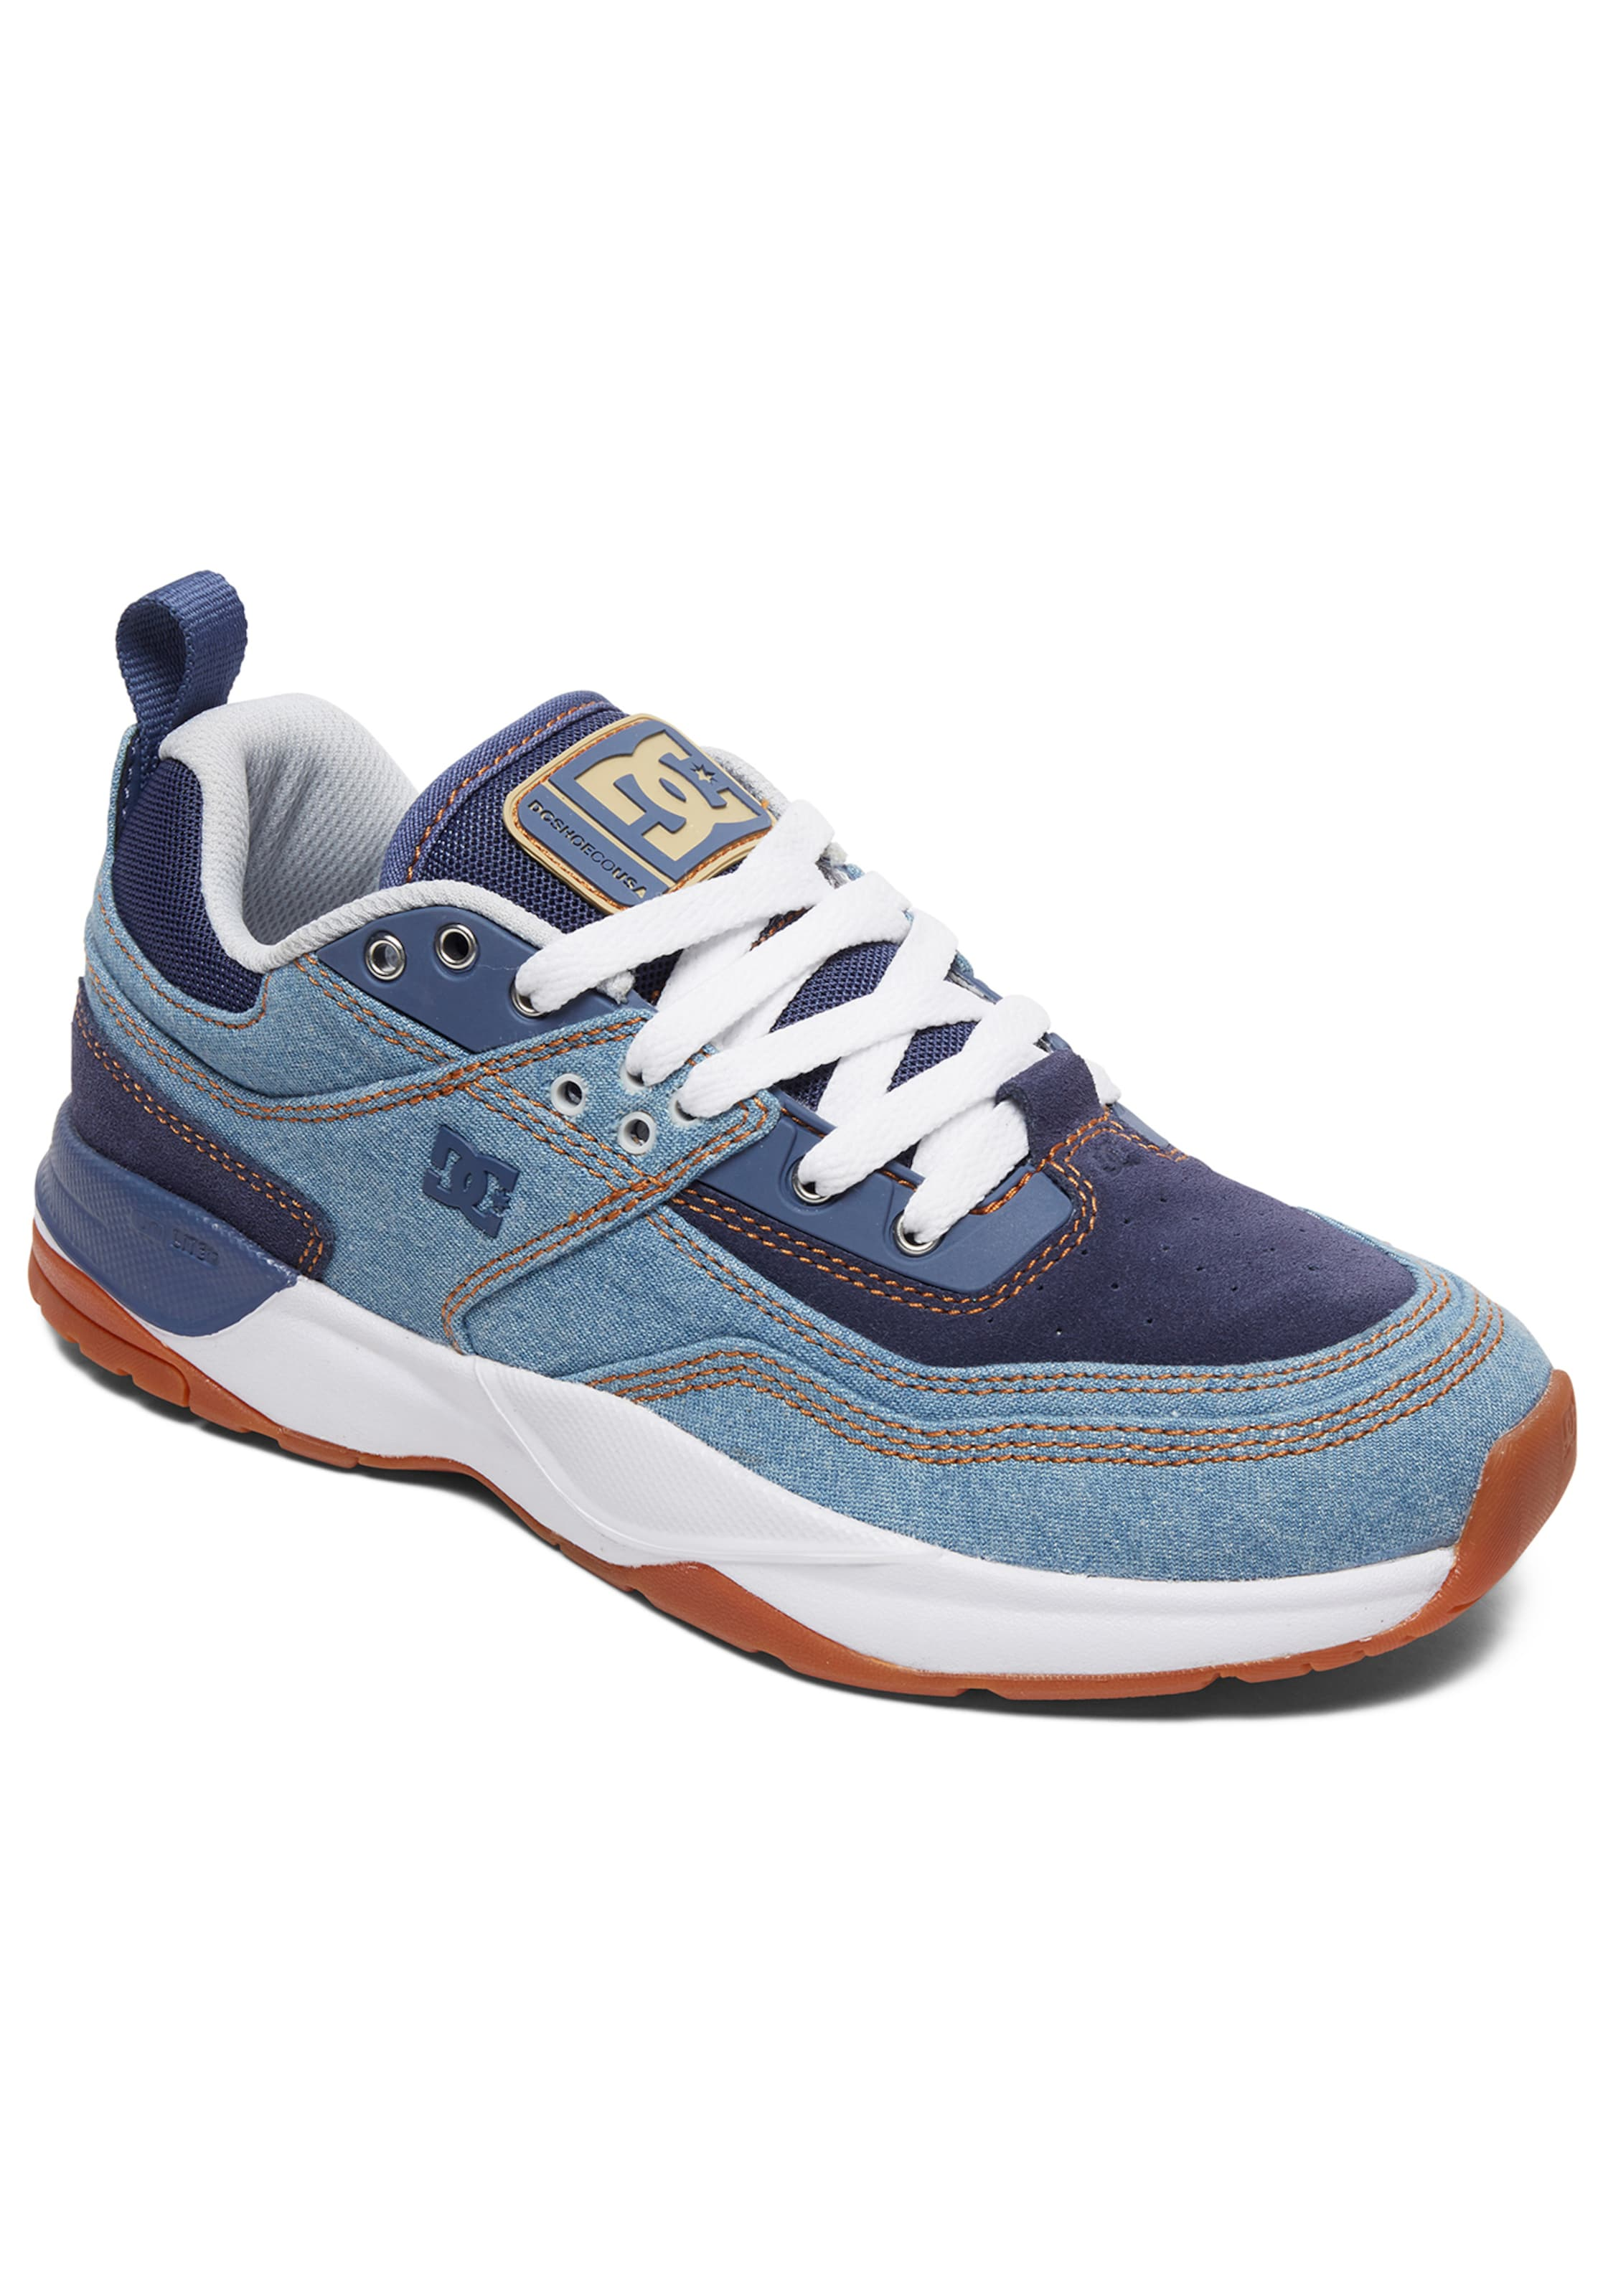 Dc Se' Tx ' Sneaker Hellblau Shoes In NachtblauTaubenblau n0PwkOX8